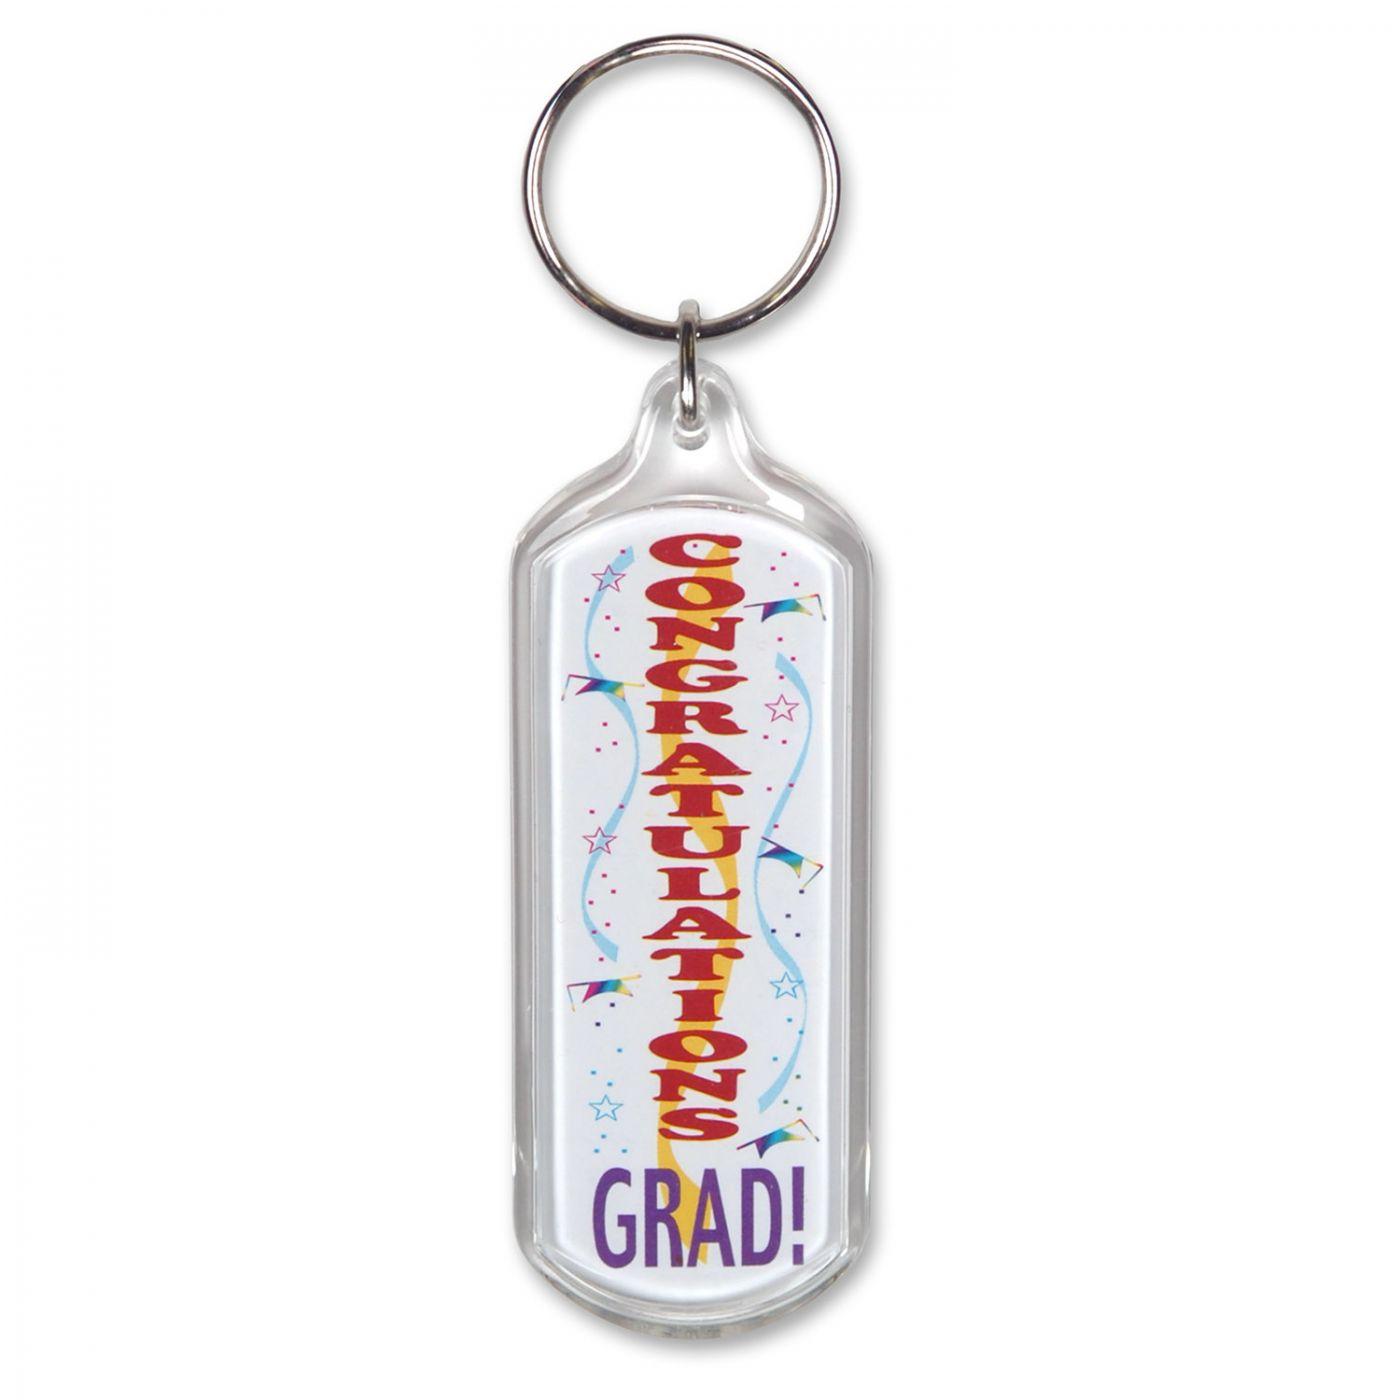 Congratulations Grad! Keychain (6) image